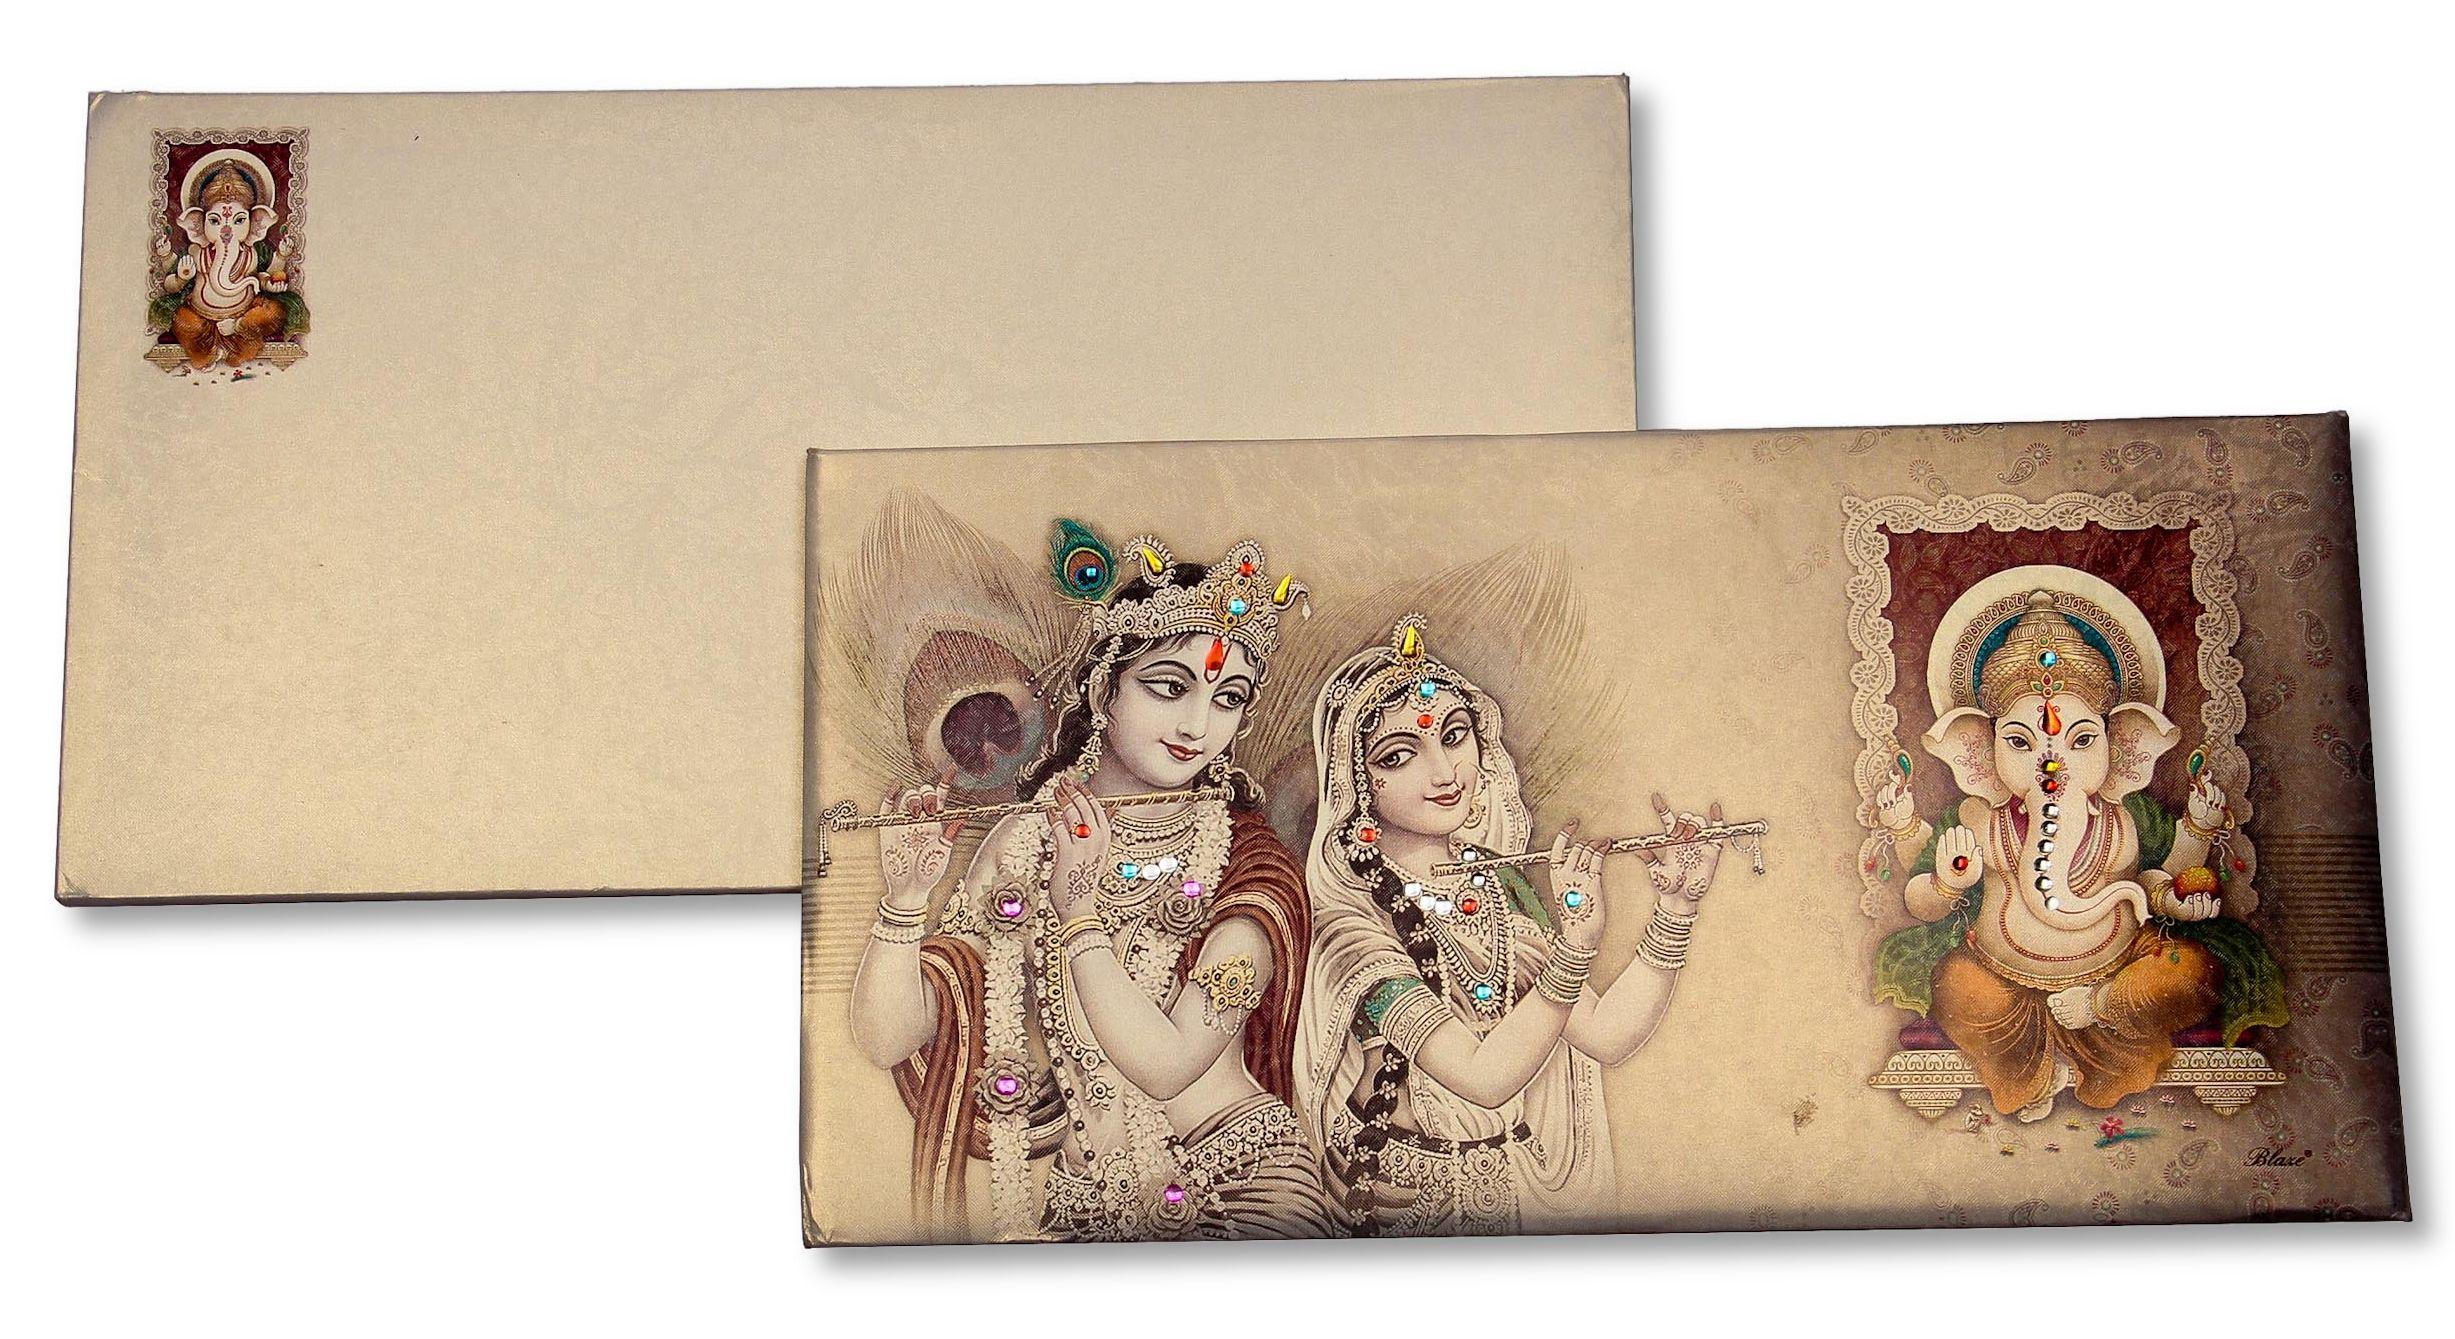 Premium Hindu Wedding Invitation Cards Prabhat Mumbai